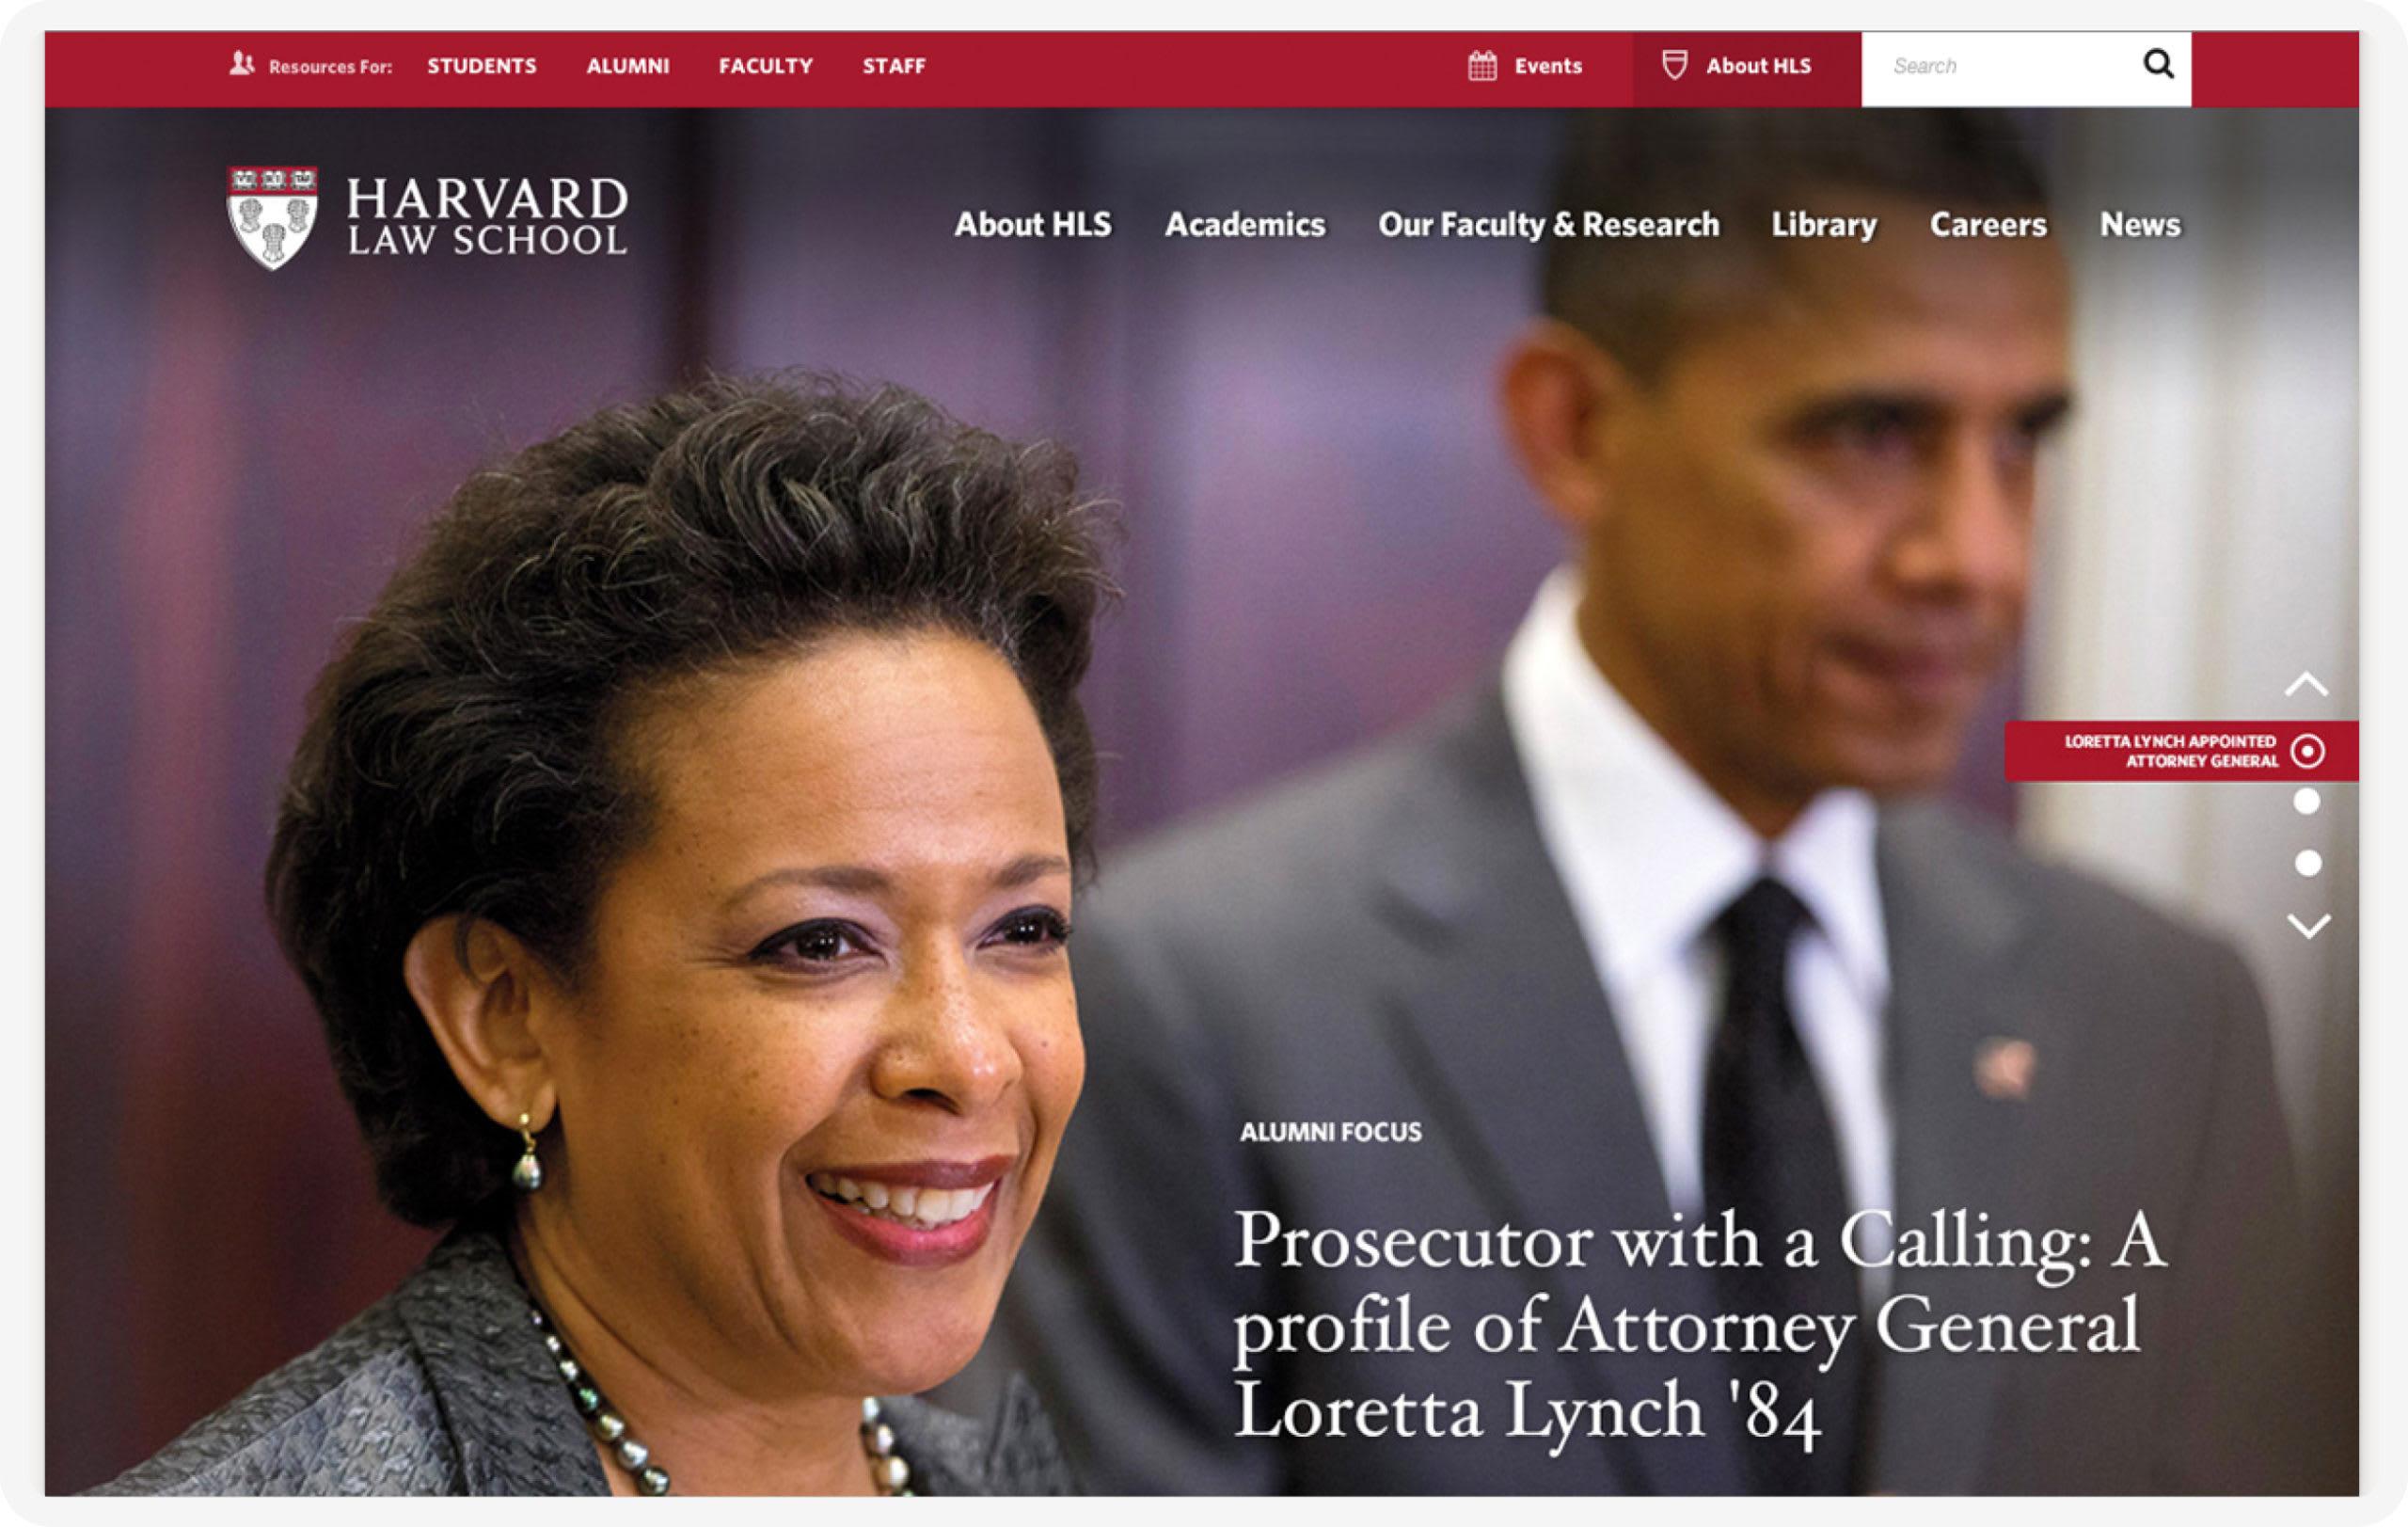 The Harvard Law School homepage featuring Loretta Lynch and Barack Obama